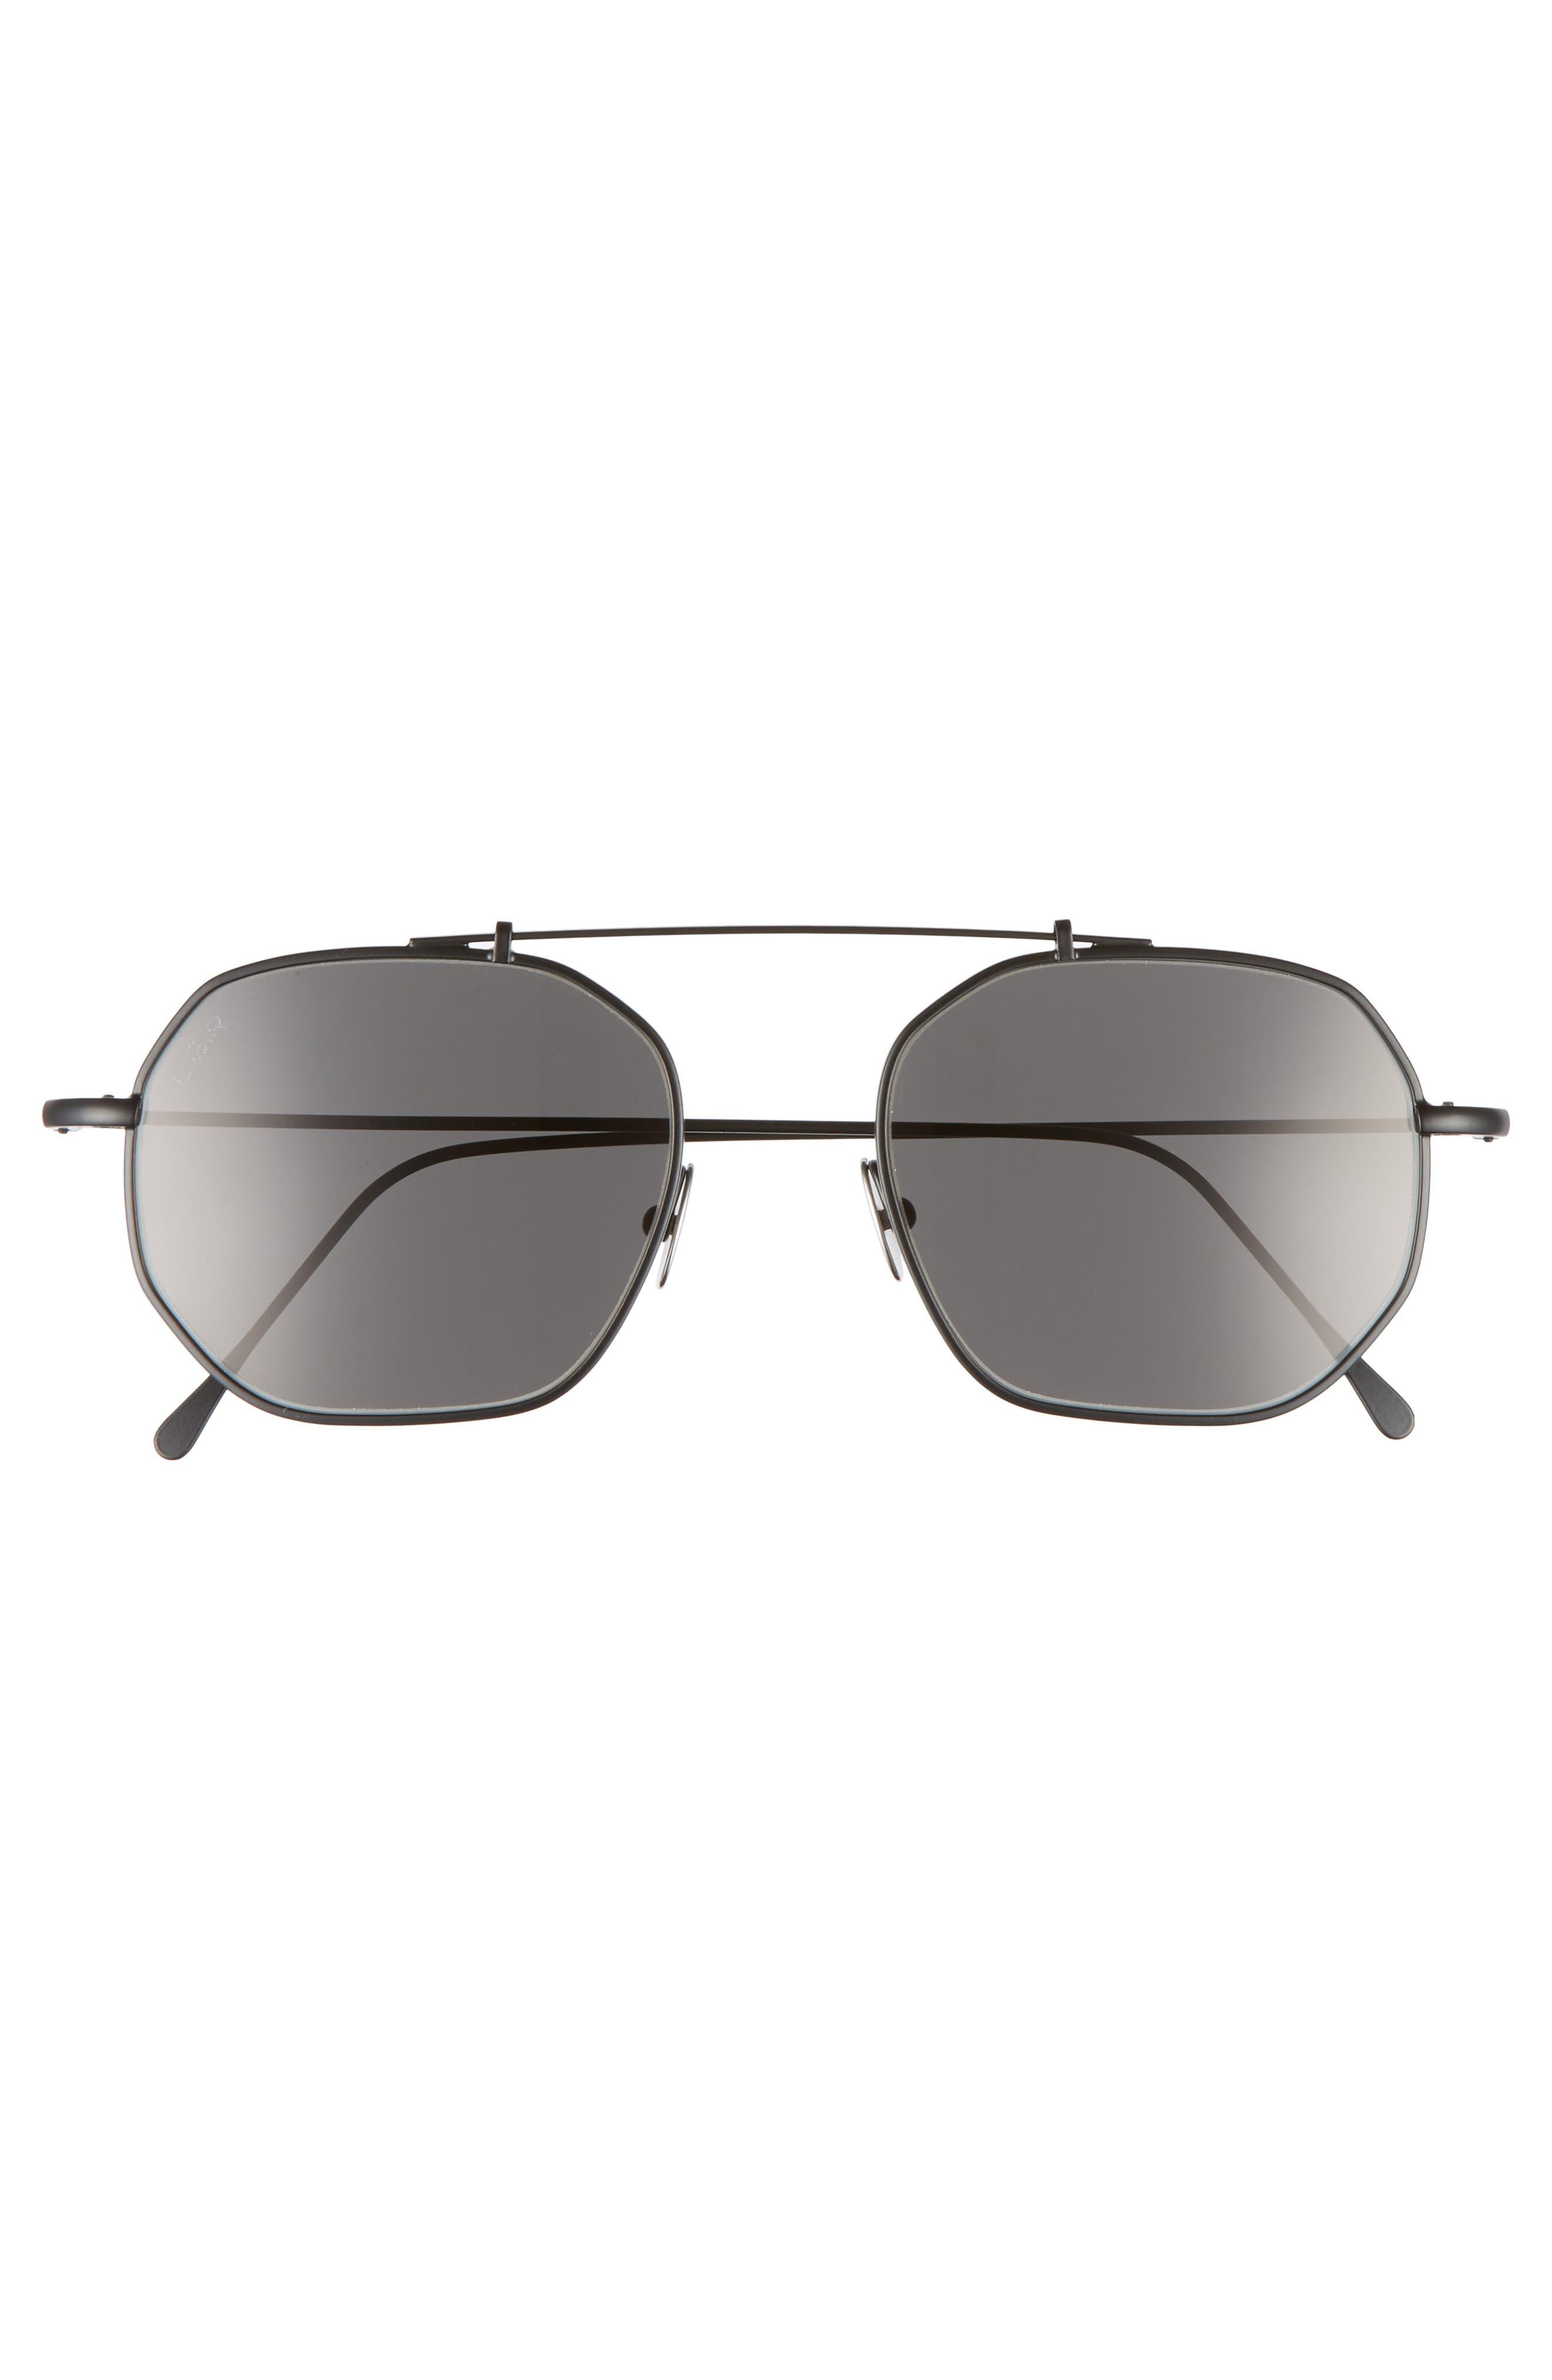 Nomad 52mm Sunglasses,                             Alternate thumbnail 2, color,                             001